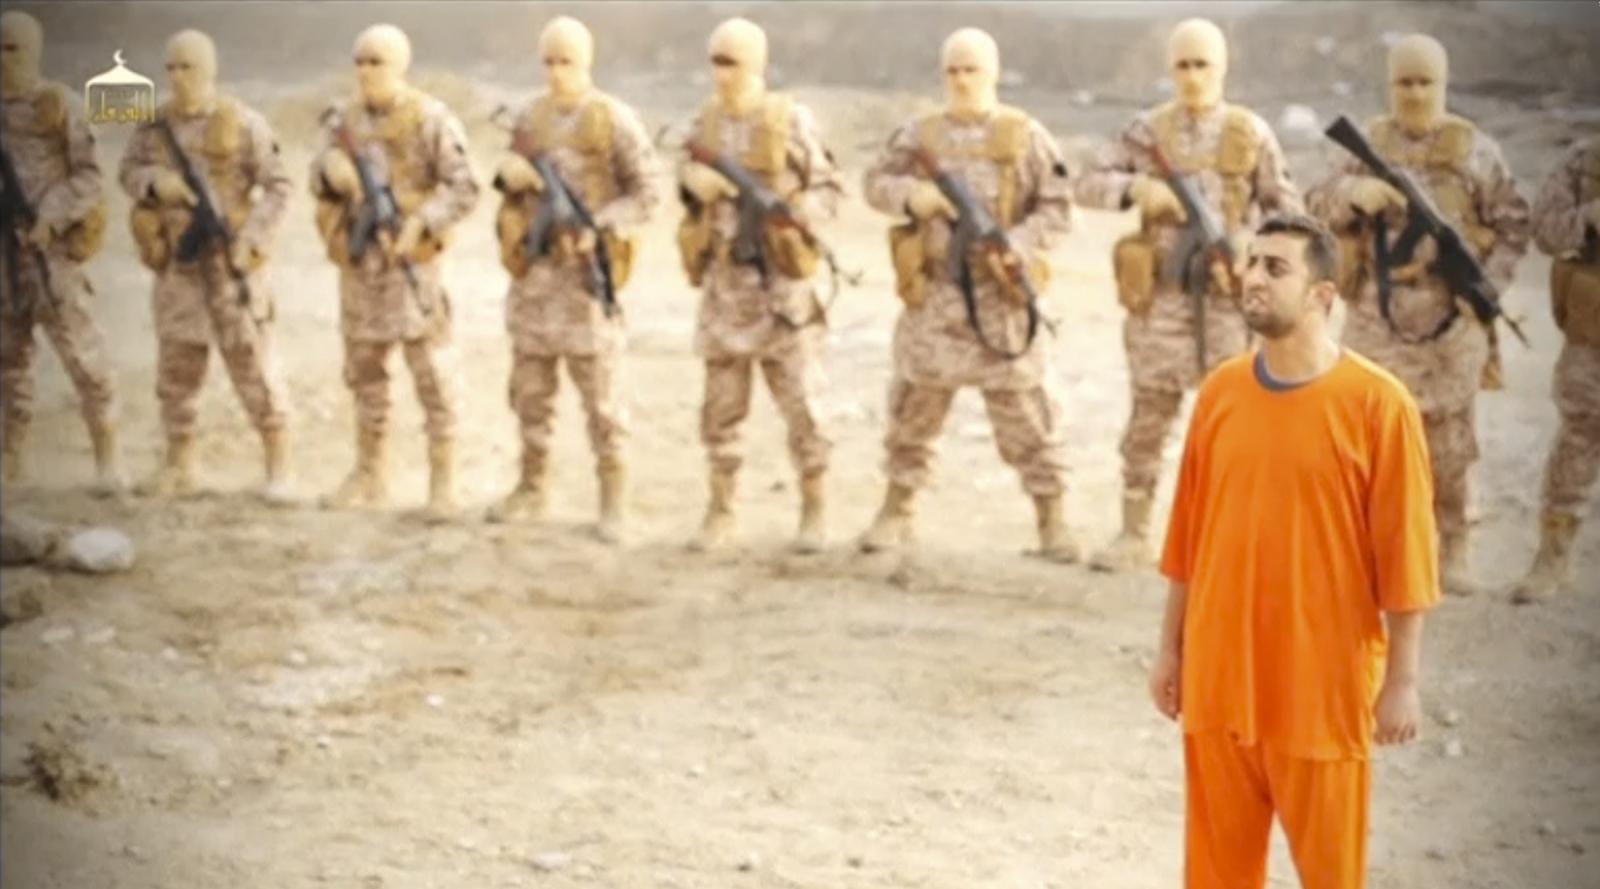 Jordanian pilot Muath al-Kasaesbeh burned alive